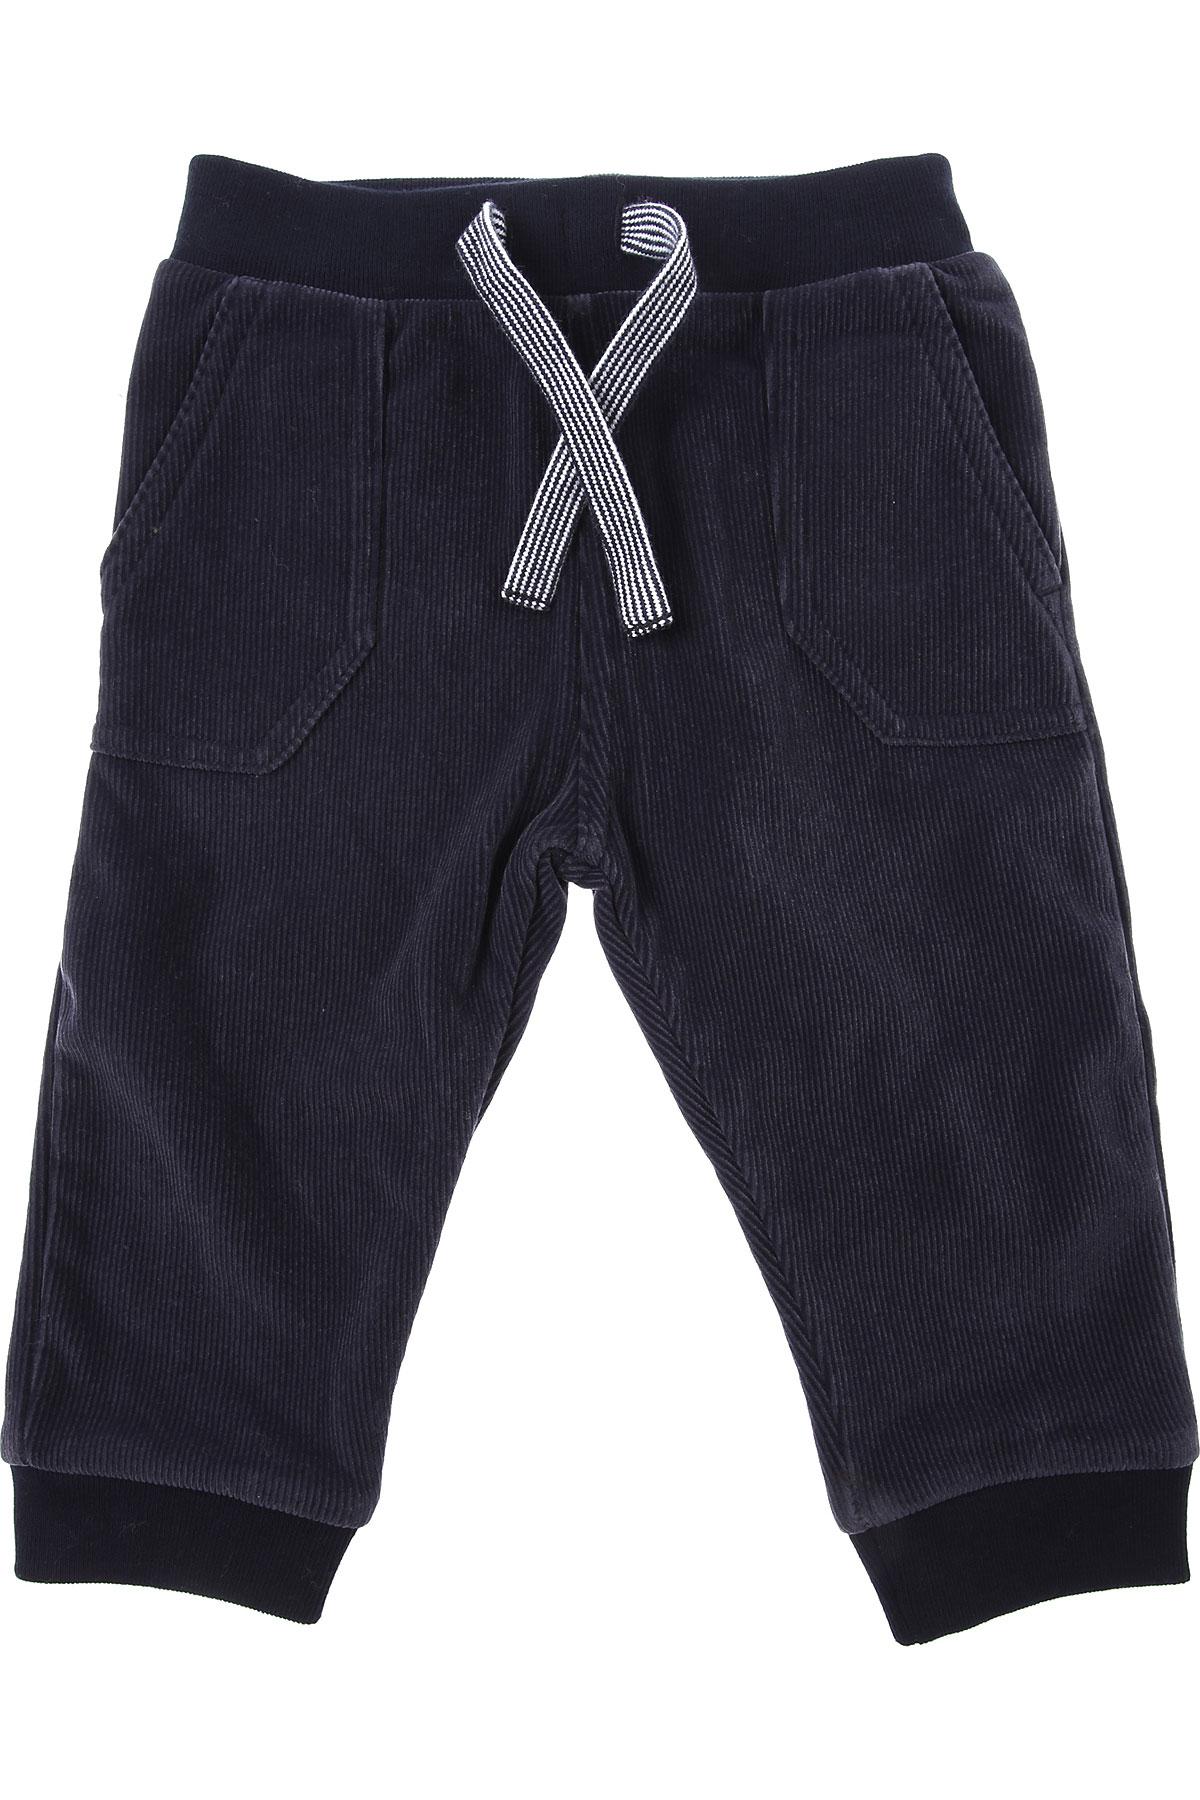 Petit Bateau Baby Sweatpants for Boys On Sale, Dark Blue, polyamide, 2019, 12 M 18 M 2Y 6M